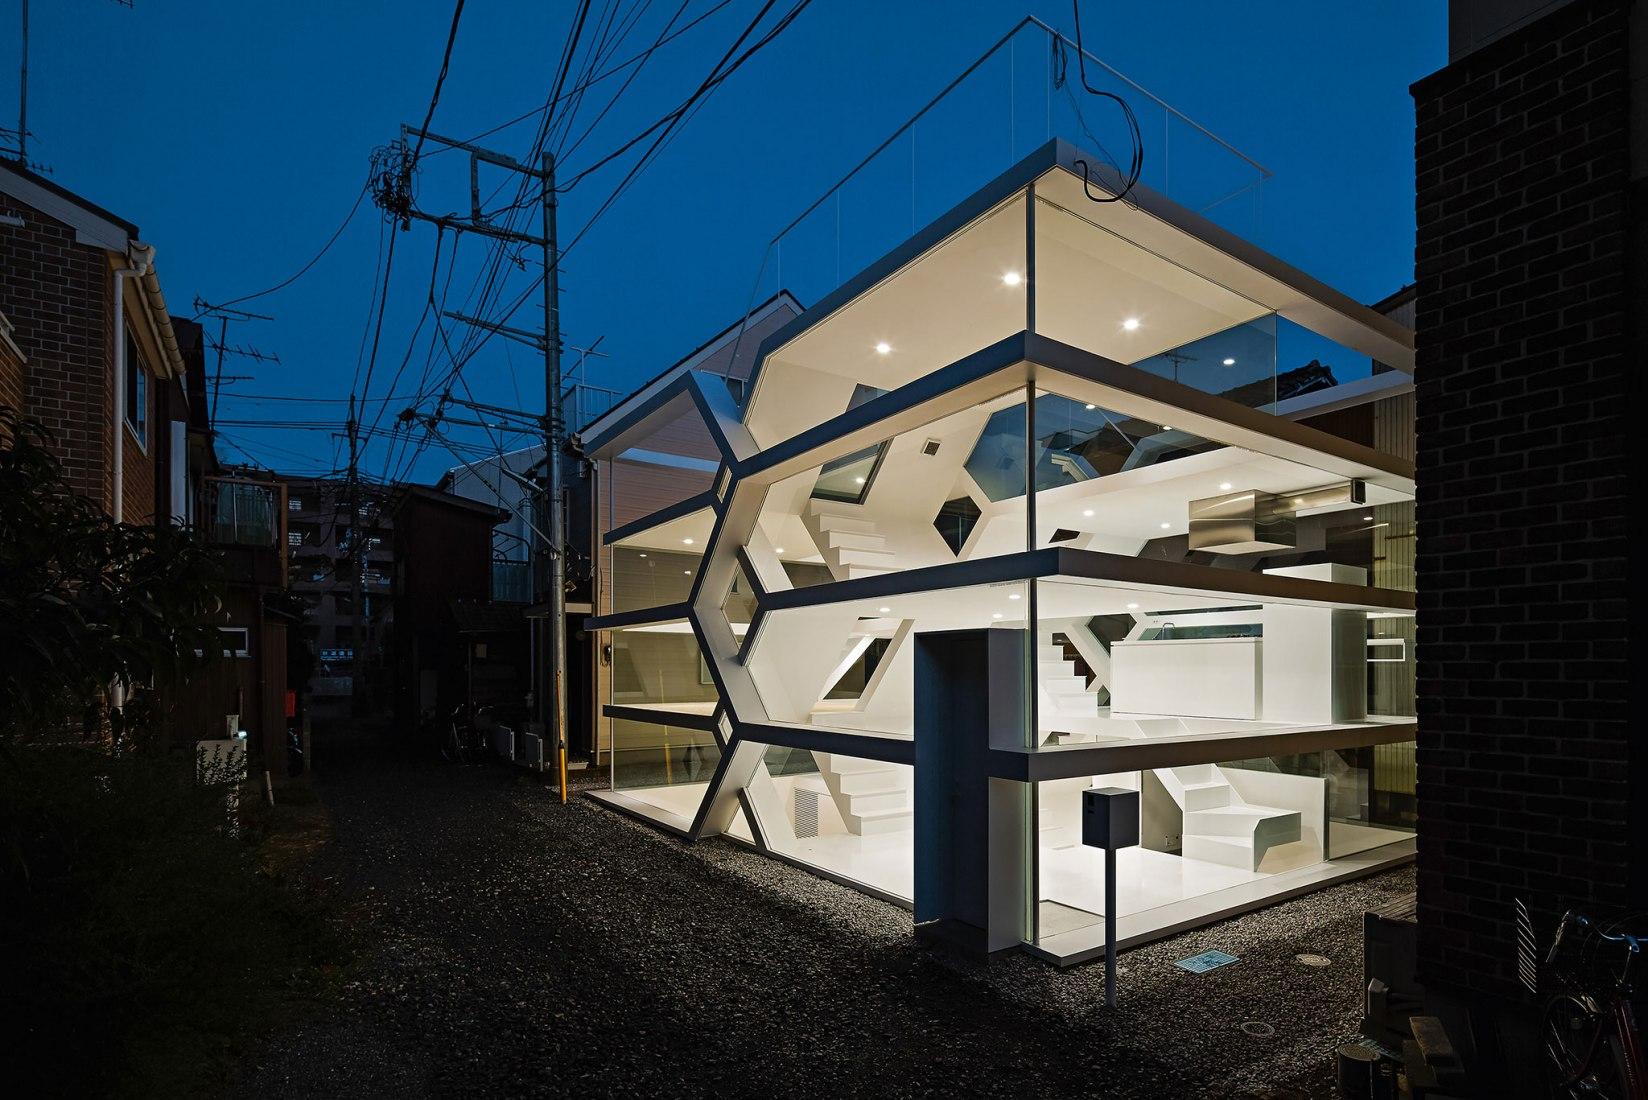 Yuusuke Karasawa - S-House, Omiya, Saitama, Japón, 2013. Contemporary Japanese Architecture por Philip Jodidio. Fotografía por © Koichi Torimura.